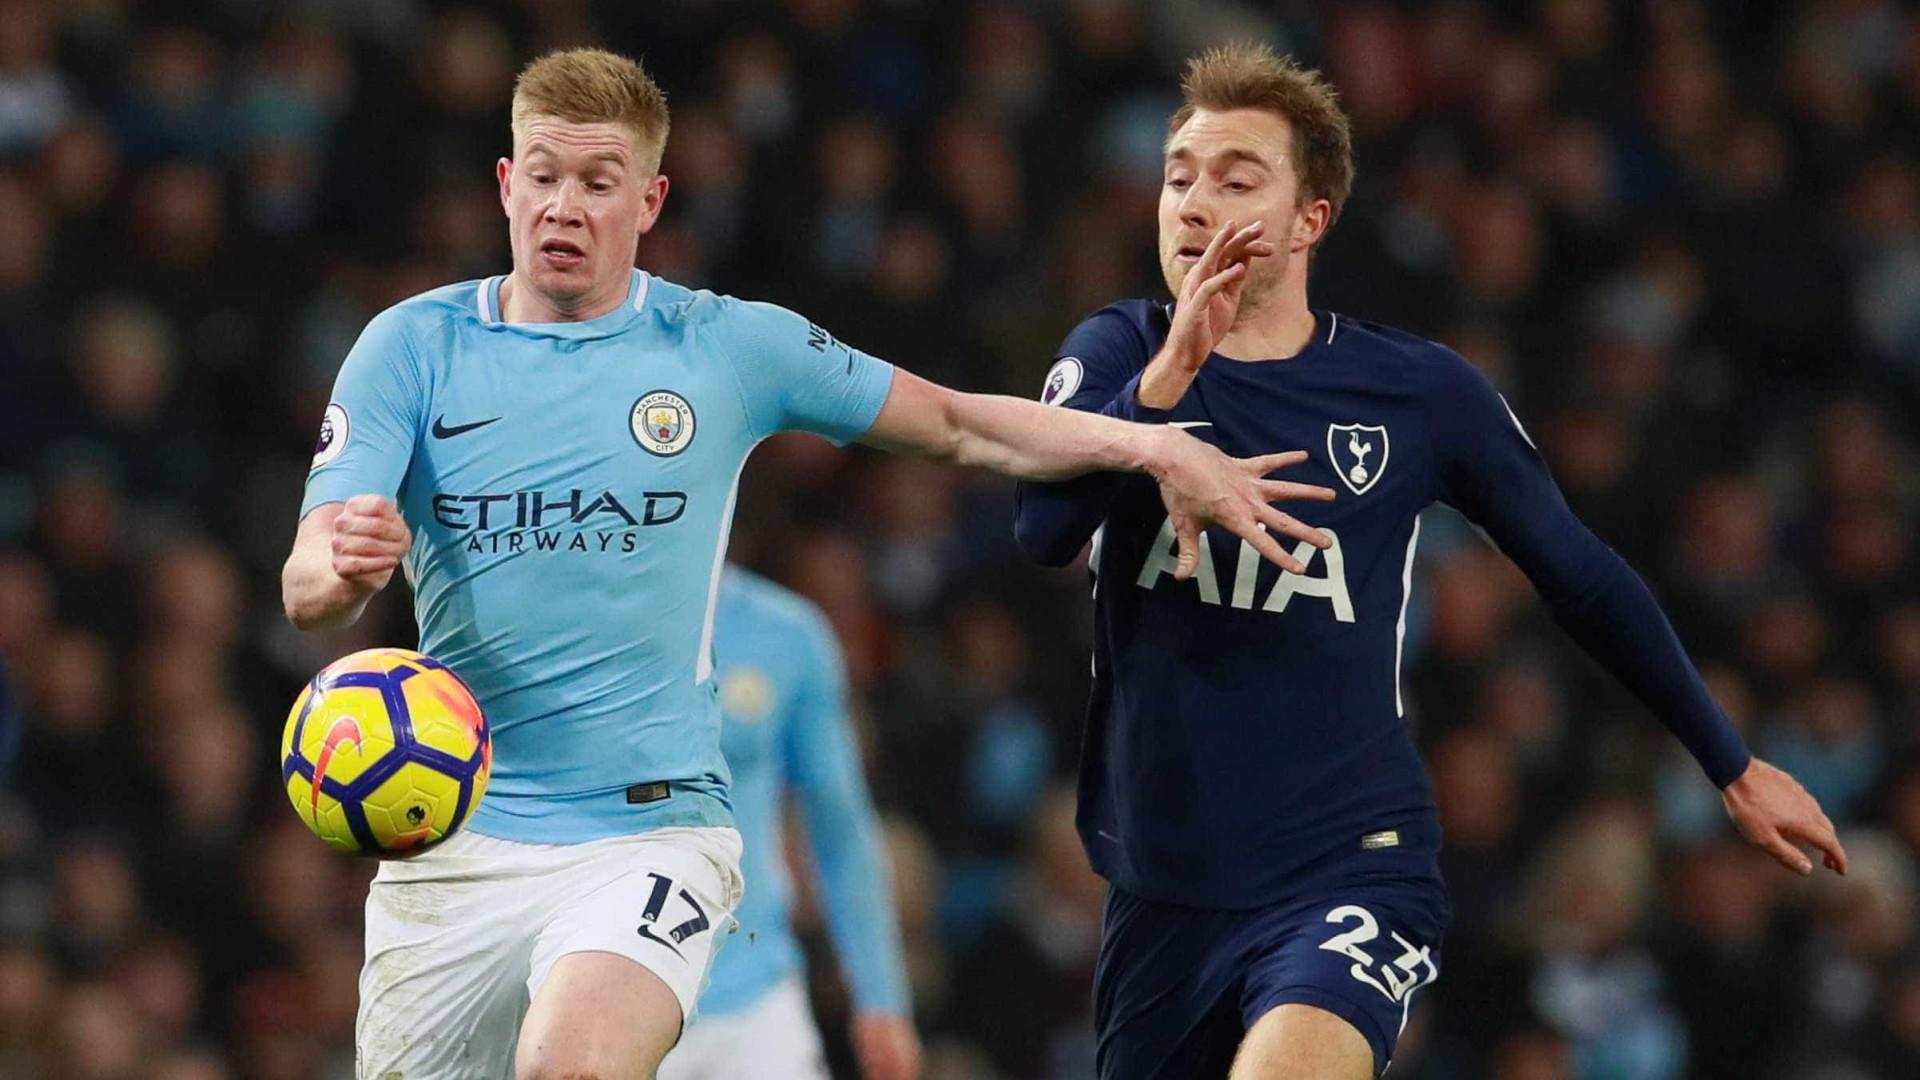 Premier League: Confira os resultados e marcadores da 34.ª jornada